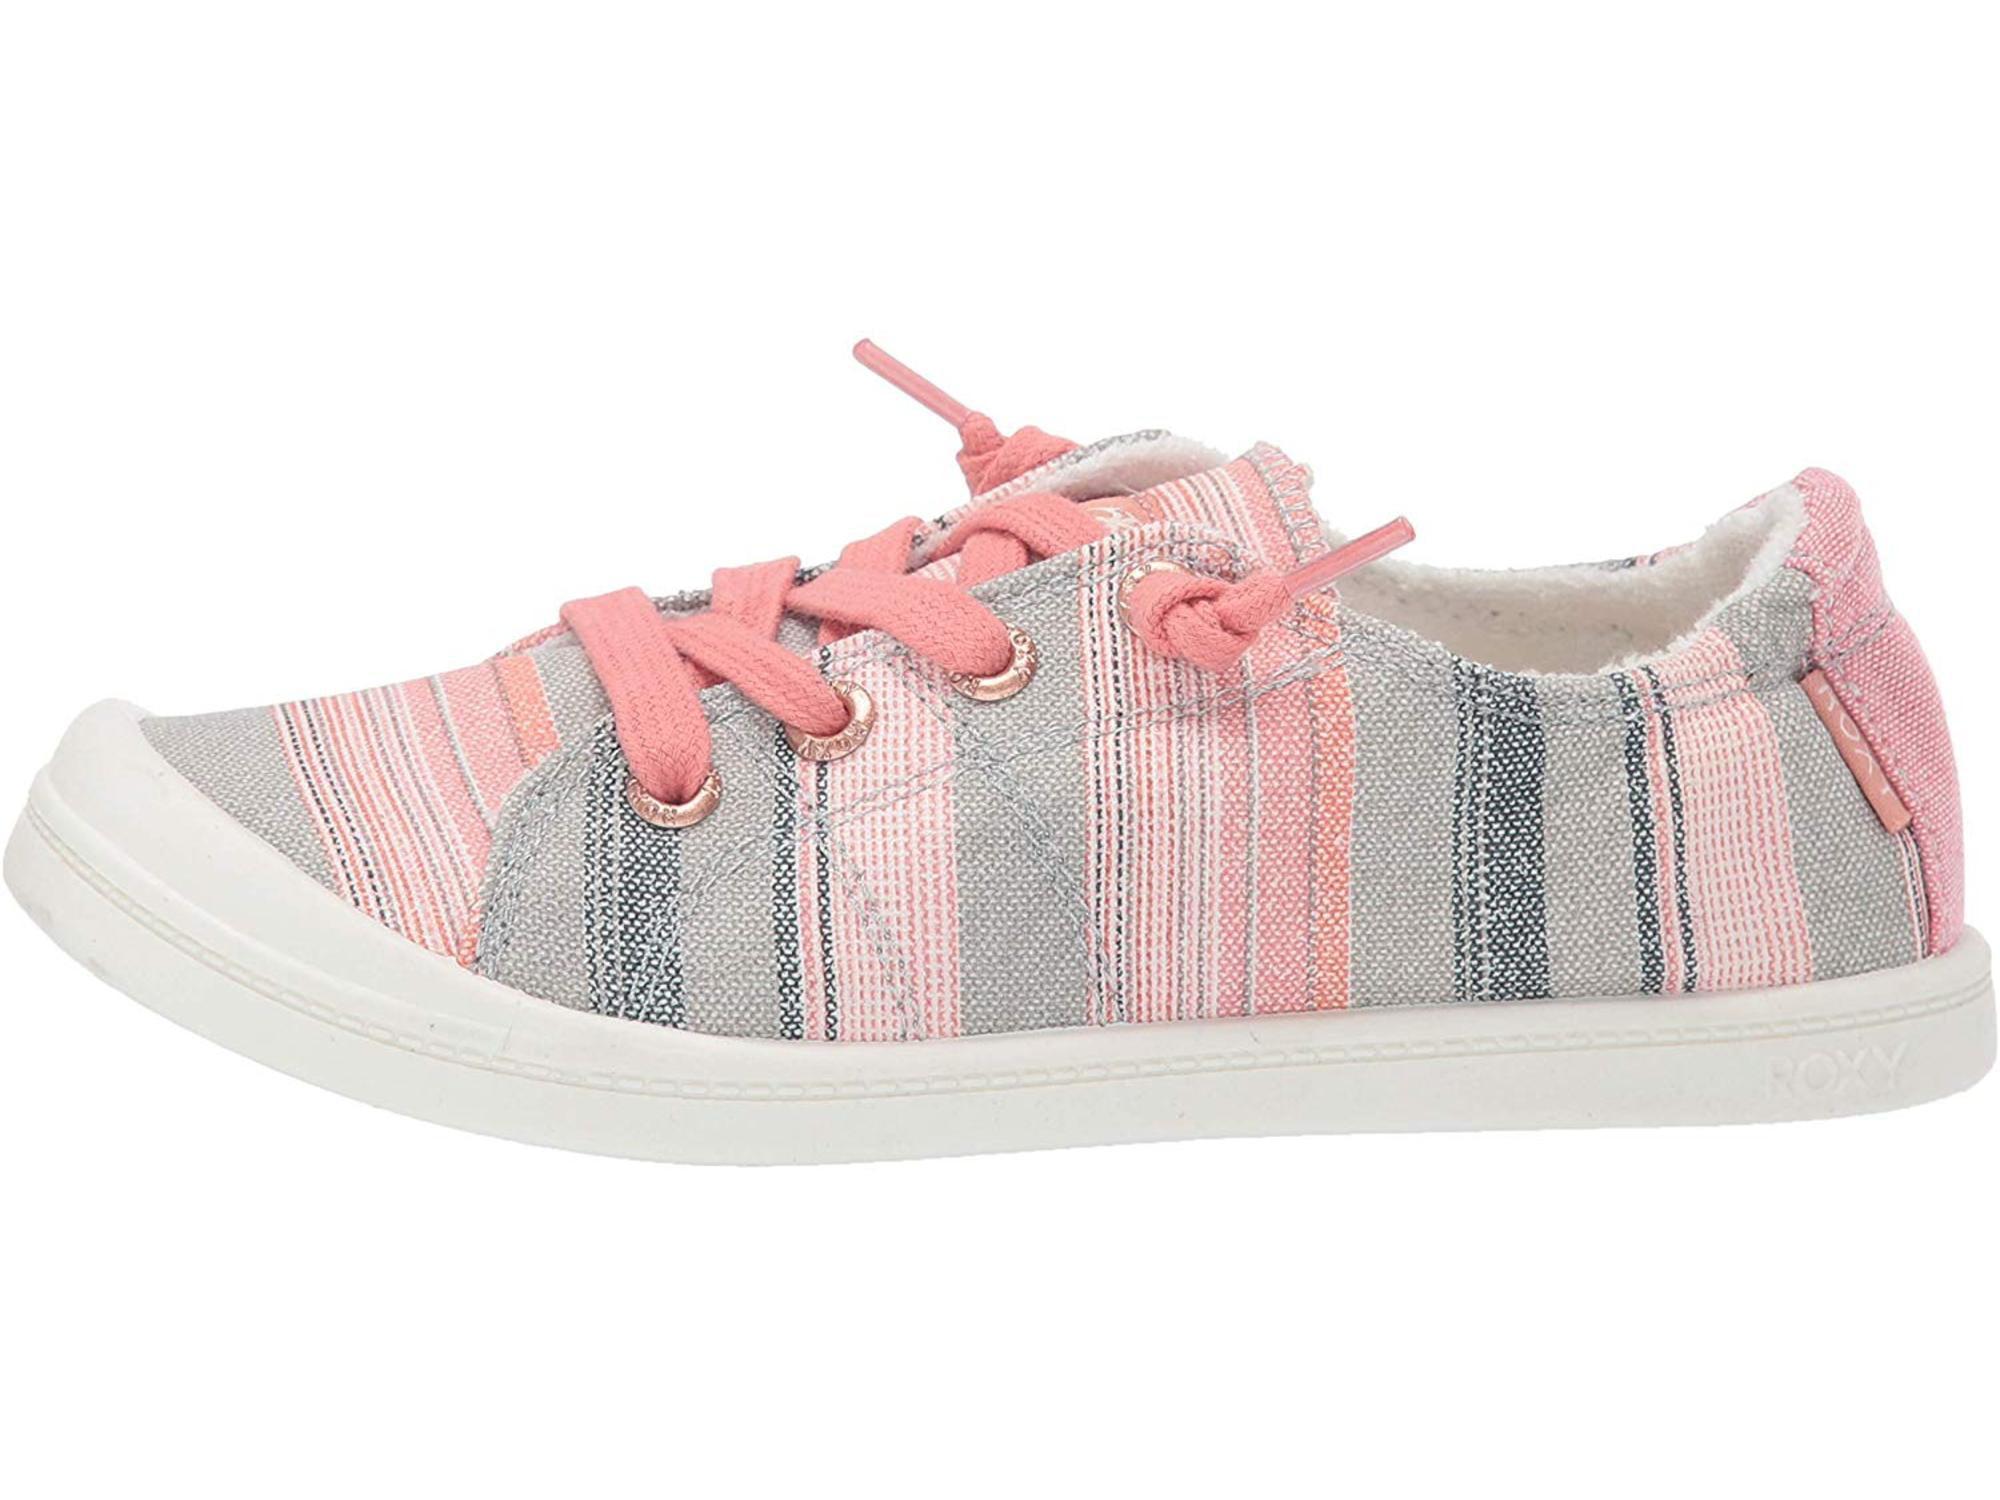 Roxy Kids' Rg Bayshore Sneaker